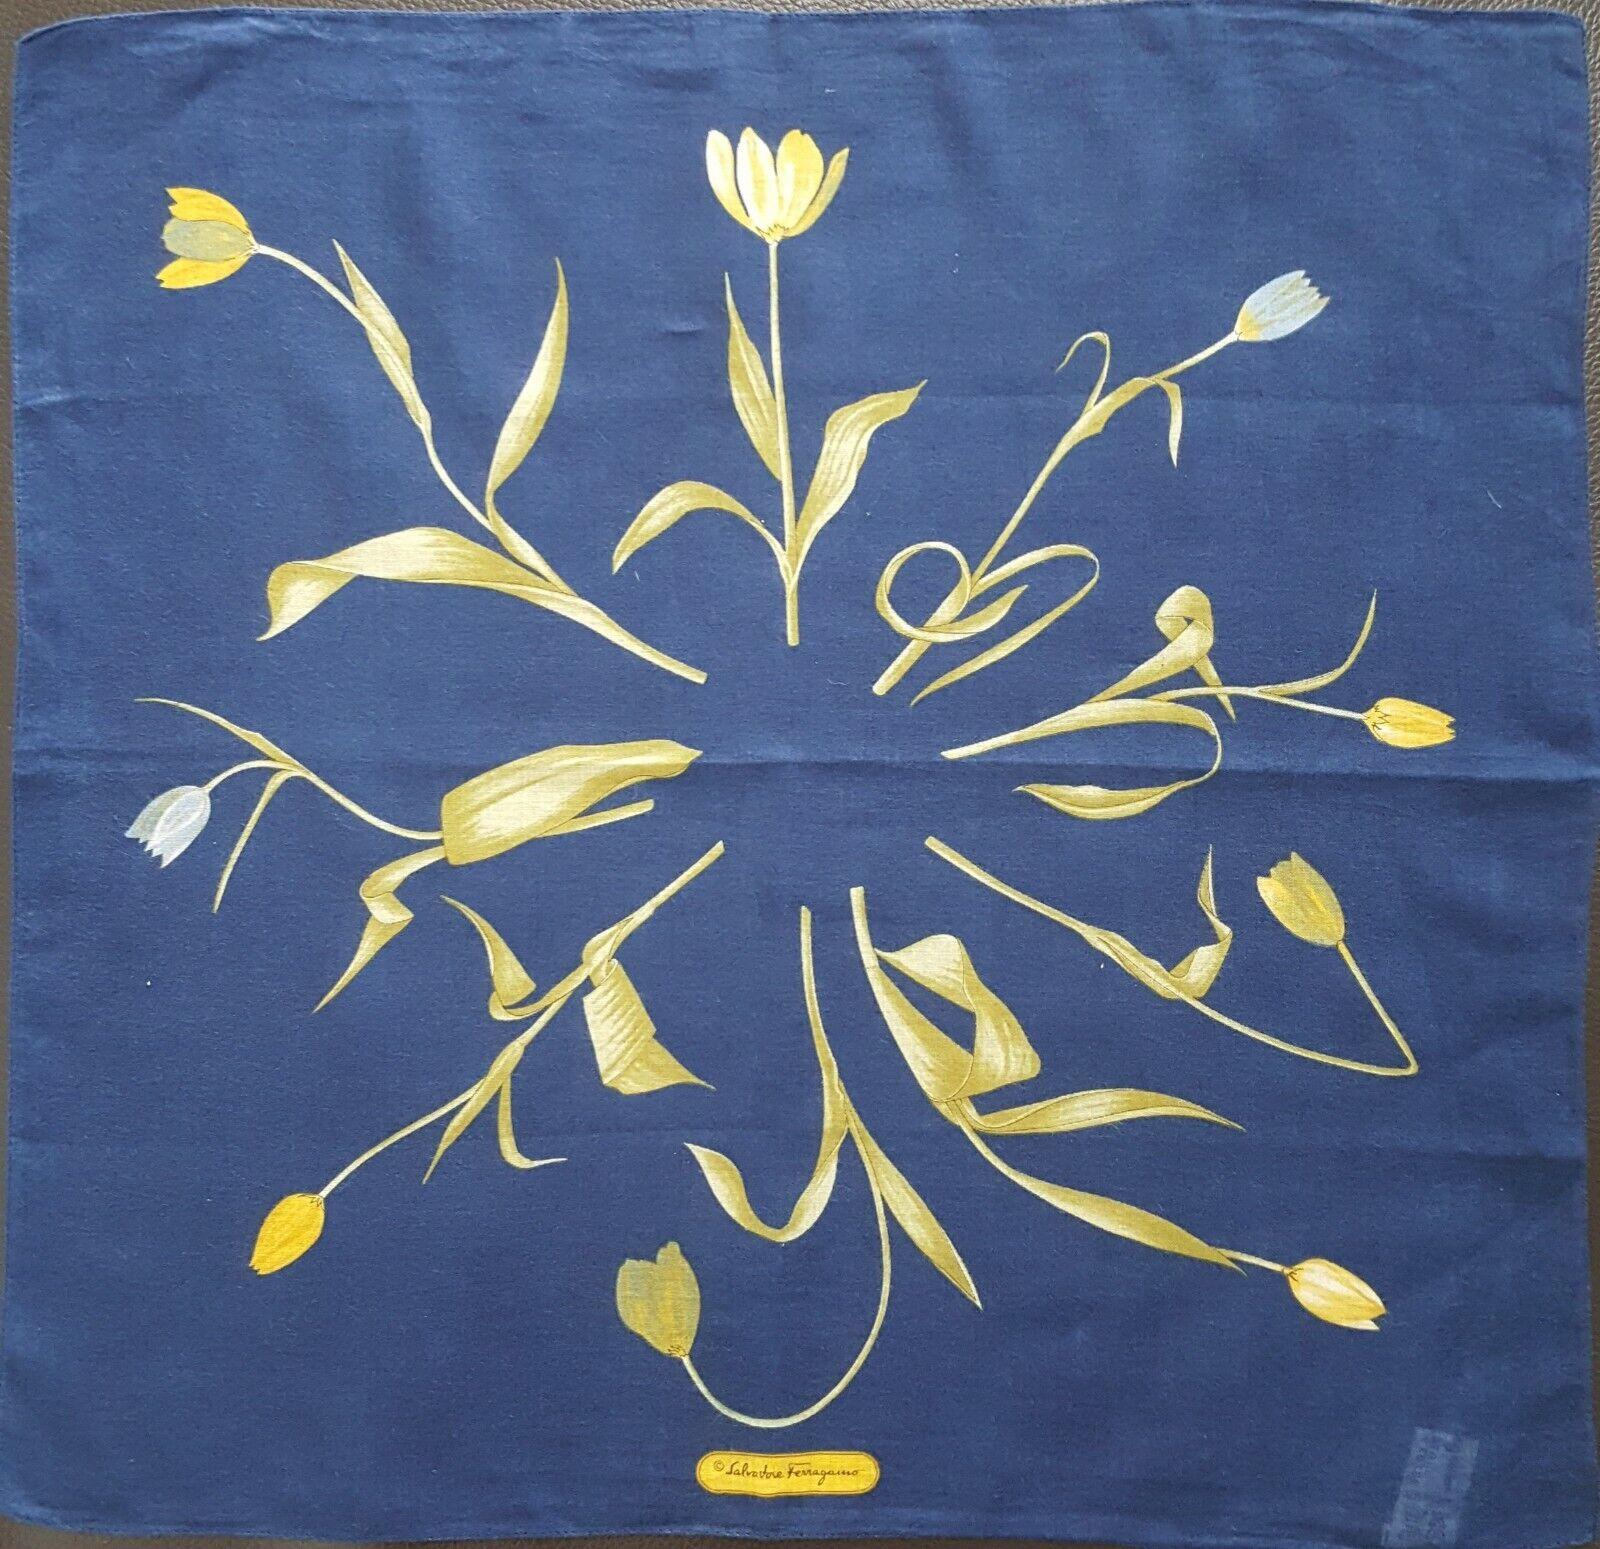 Salvatore FerragamoBlue Floral Flowers Unisex Square Thin Handkerchief 16